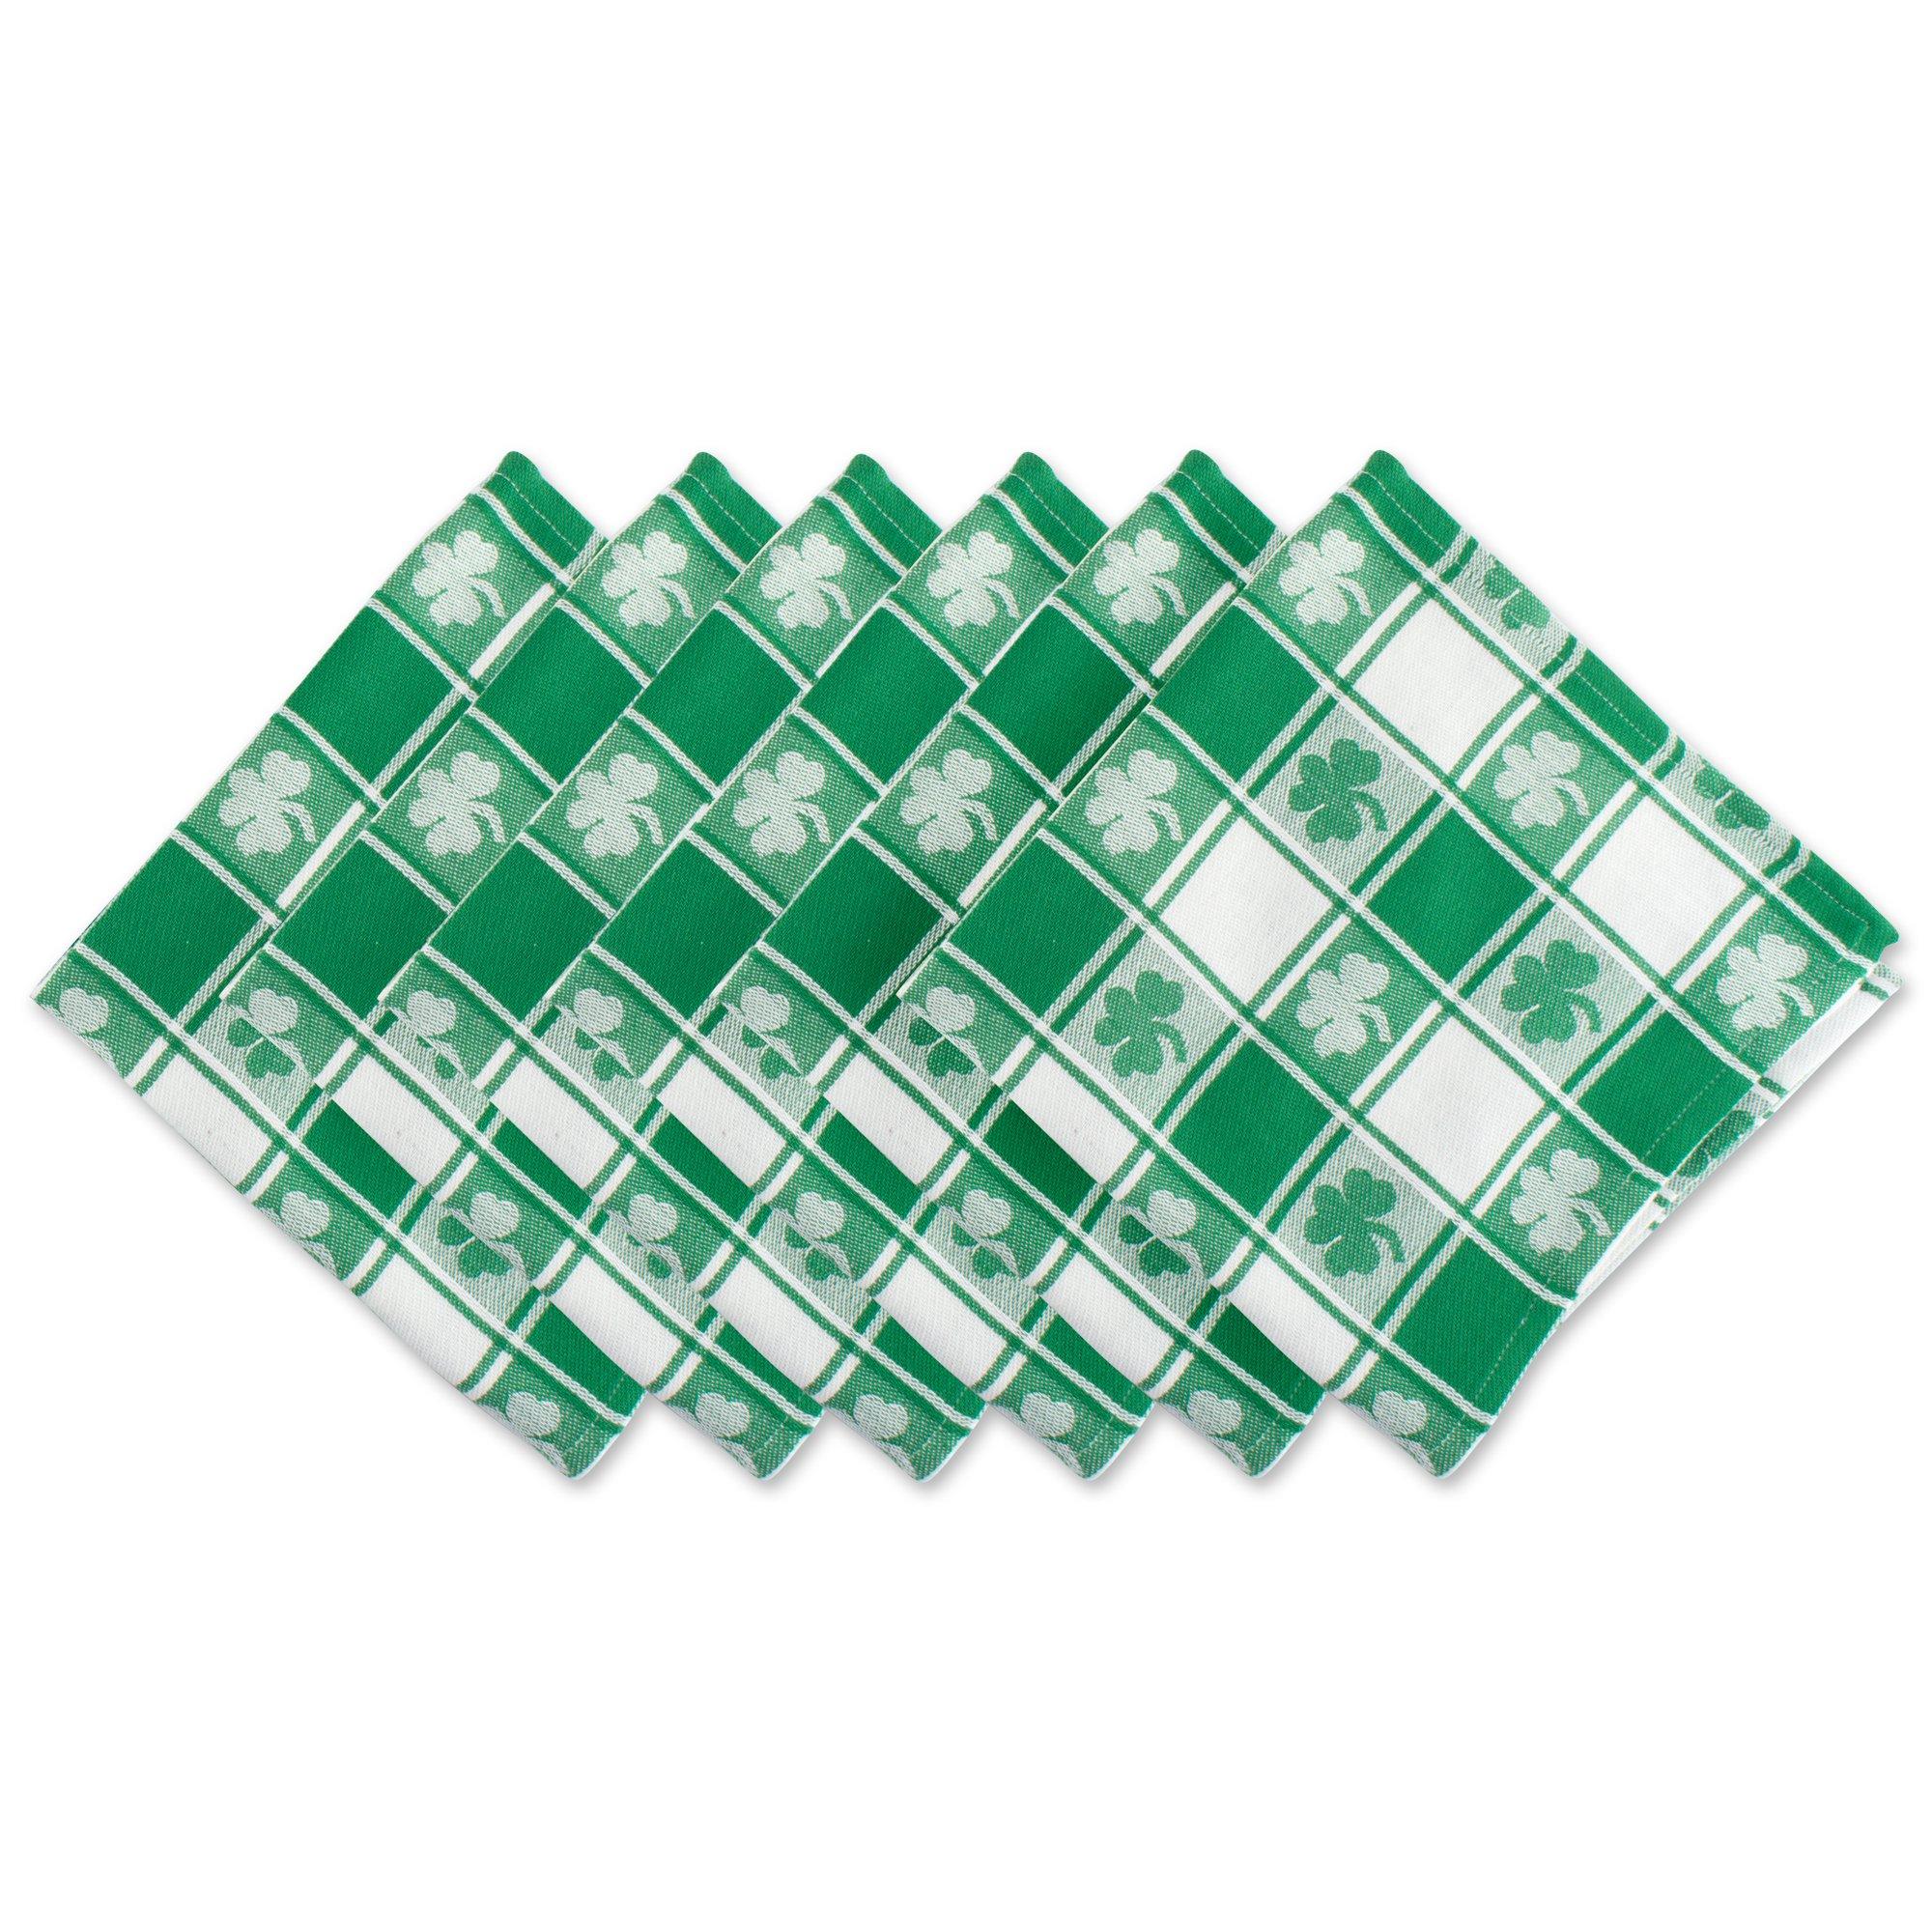 DII 100% Cotton, Oversized Basic Everyday 20x 20'' Napkin, Set of 6,  Green & White Check with Shamrock